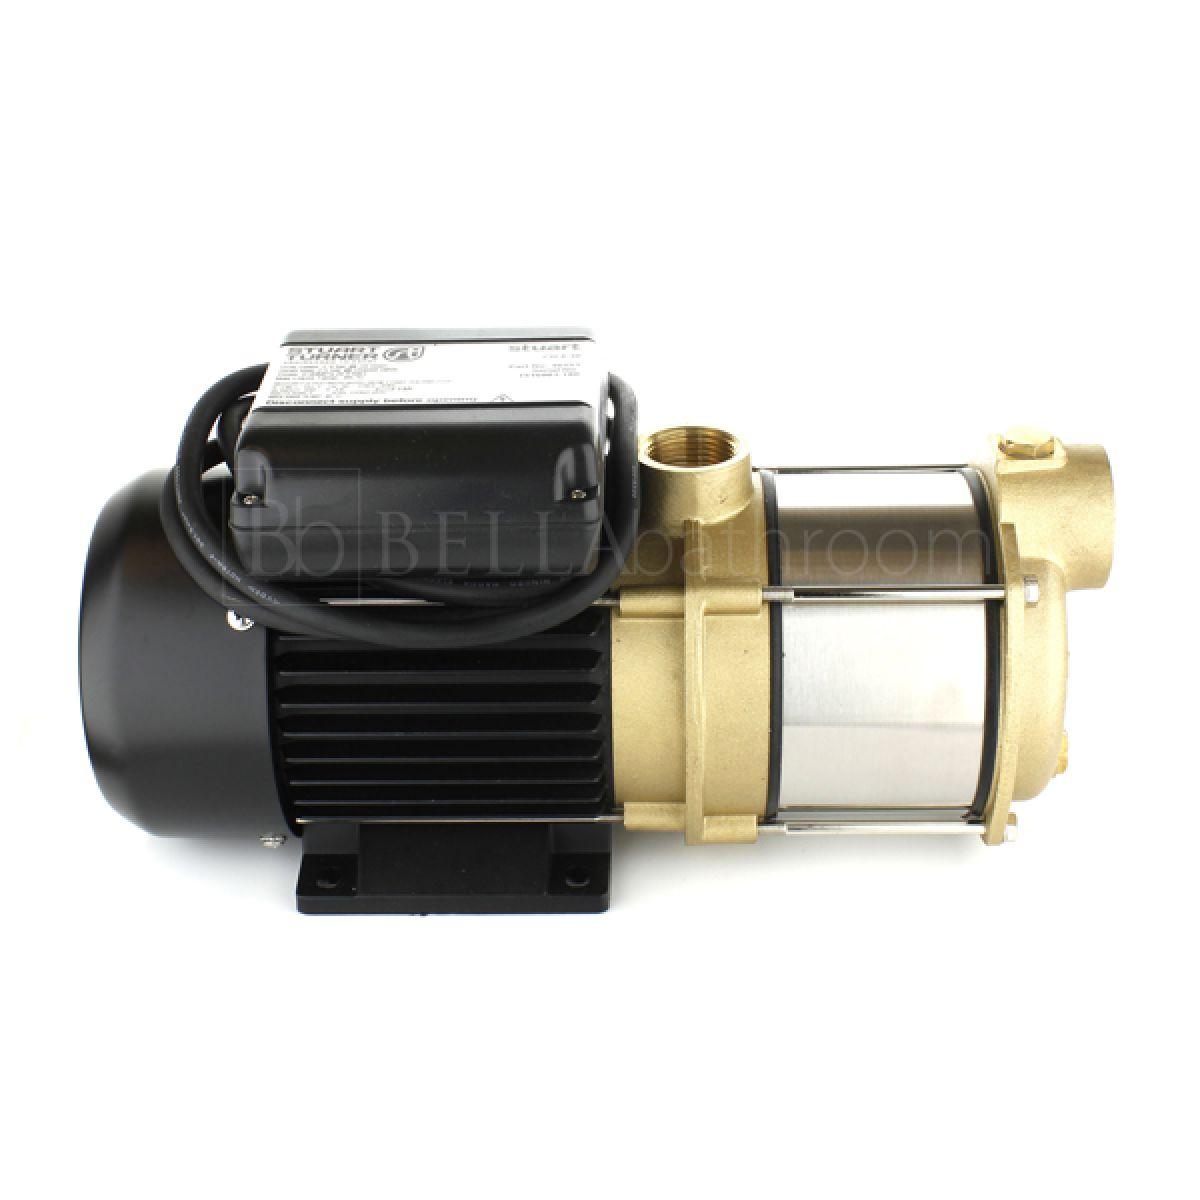 Stuart Turner 46553 CH 4-30 Centrifugal Multistage 2.5 Bar Pump Front